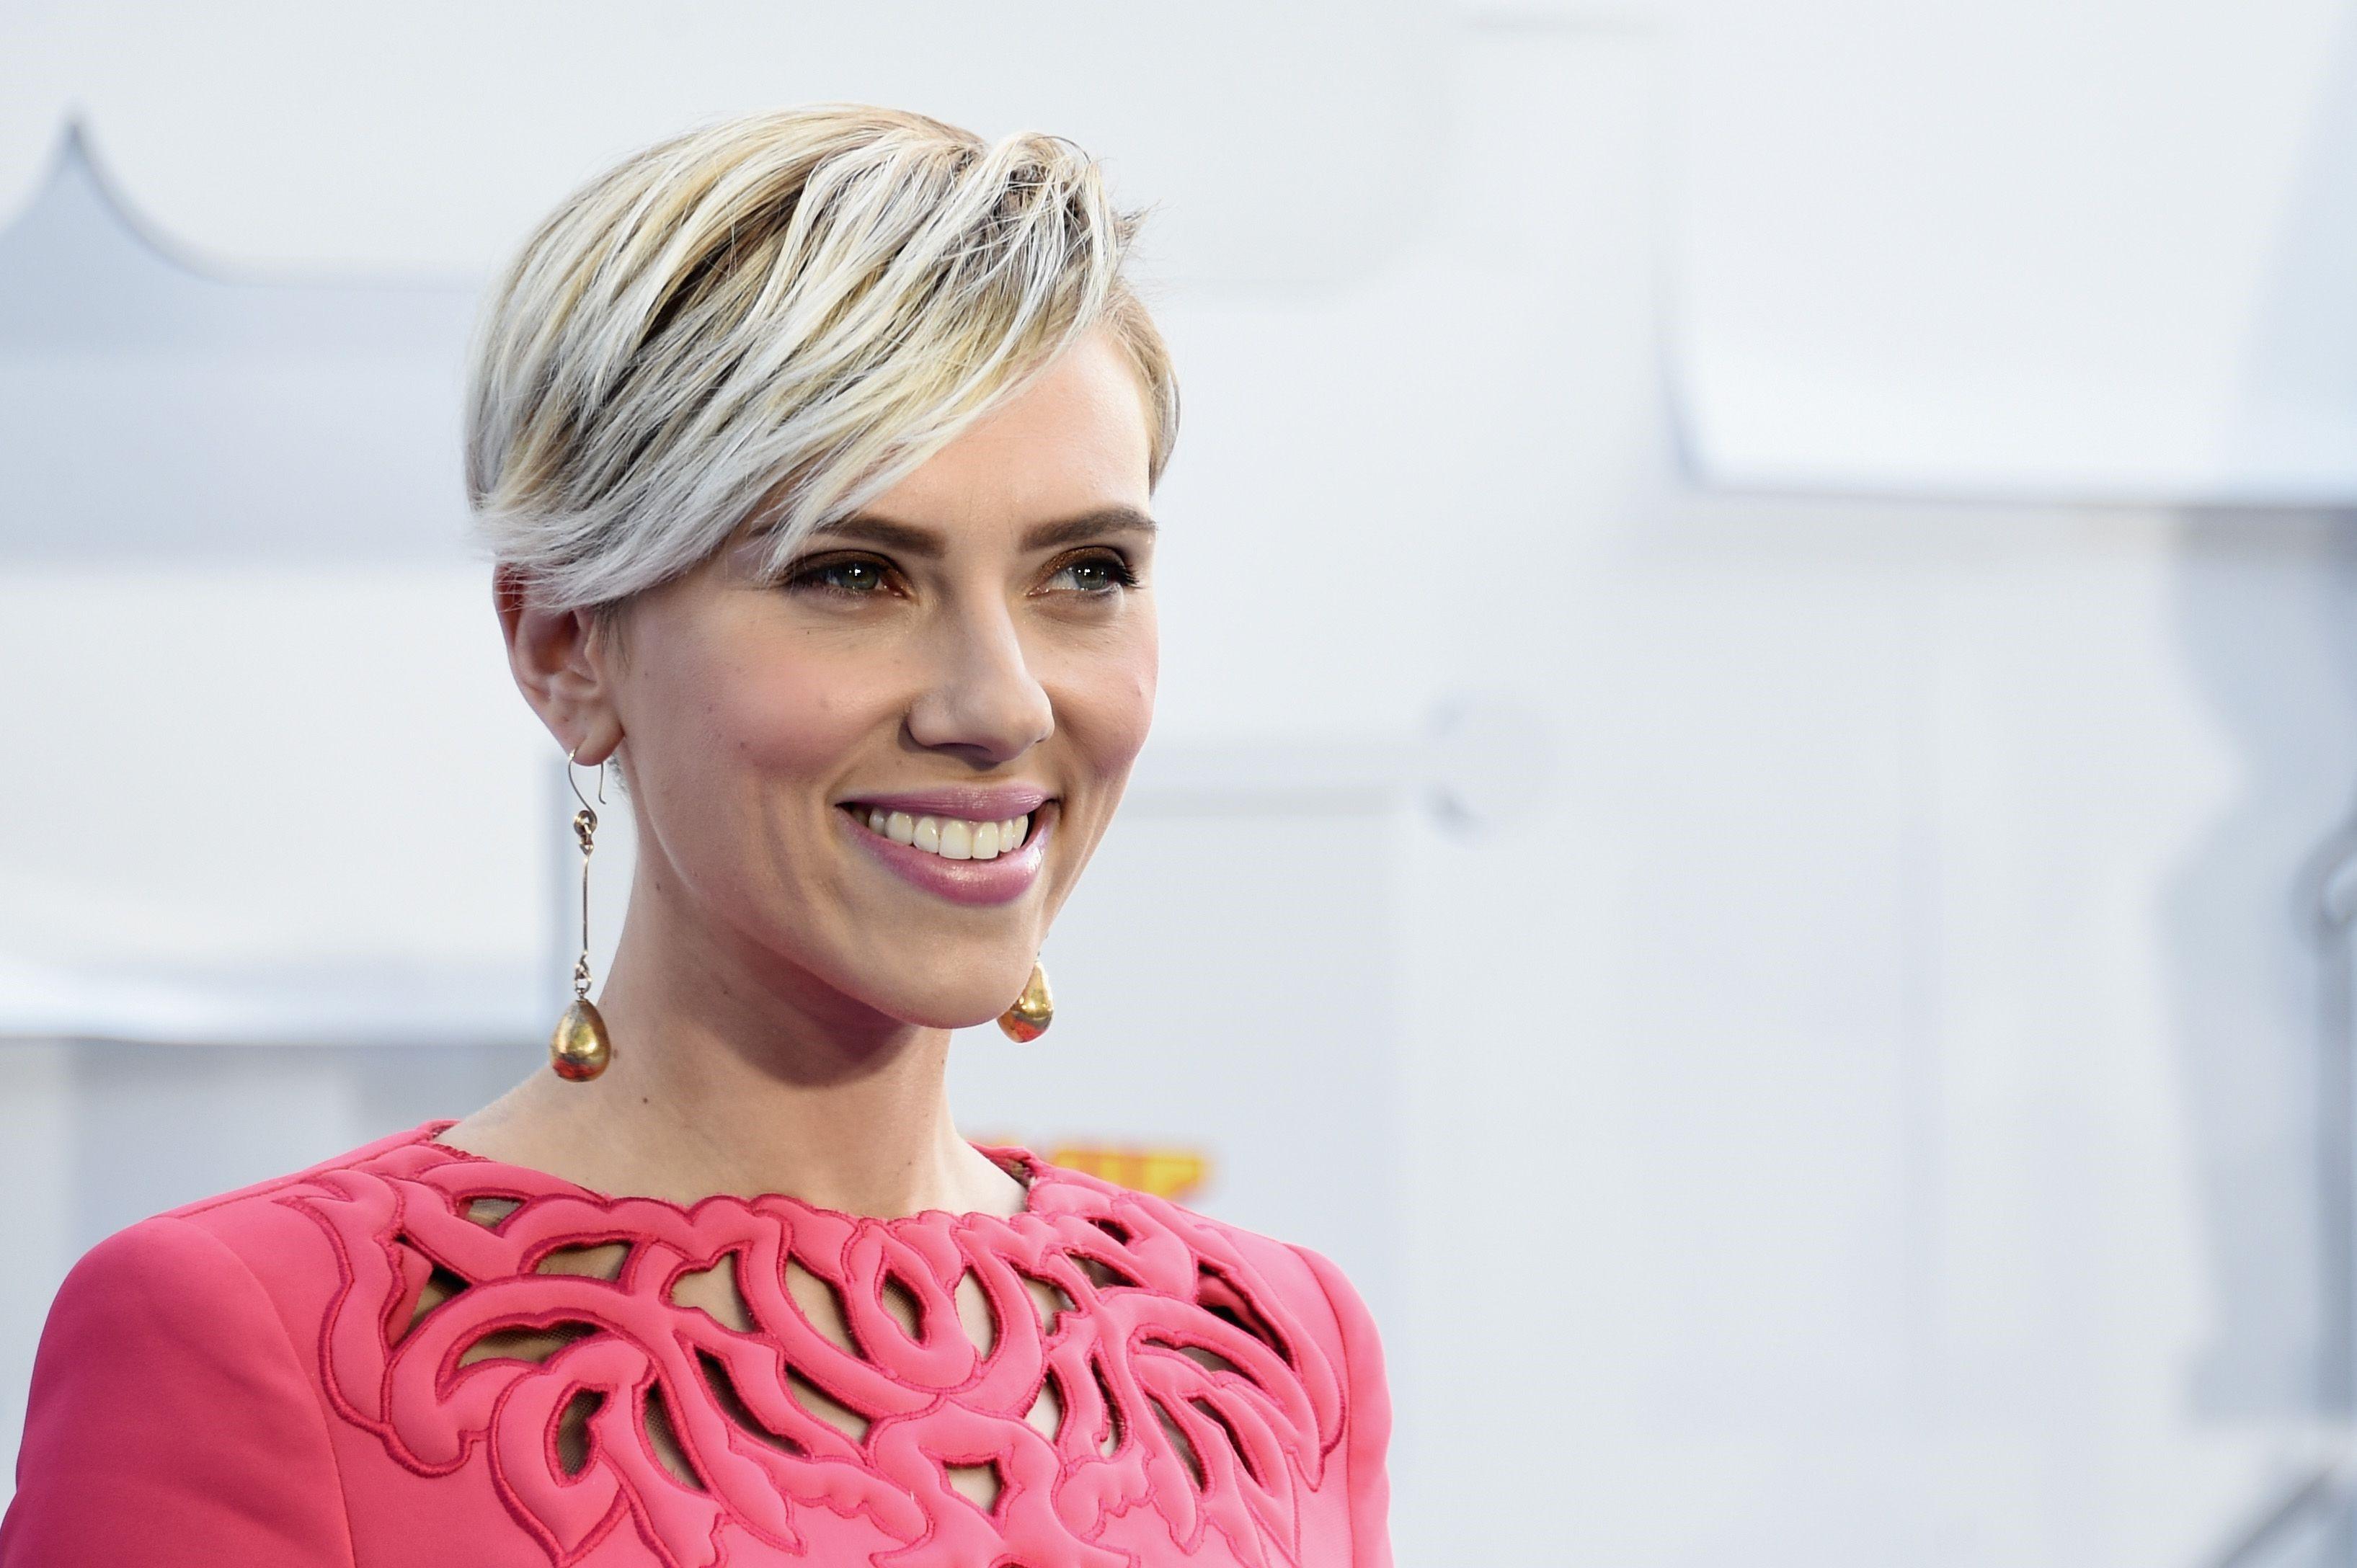 Scarlett Johansson: Ο νέος της κινηματογραφικός ρόλος προκαλεί αντιδράσεις